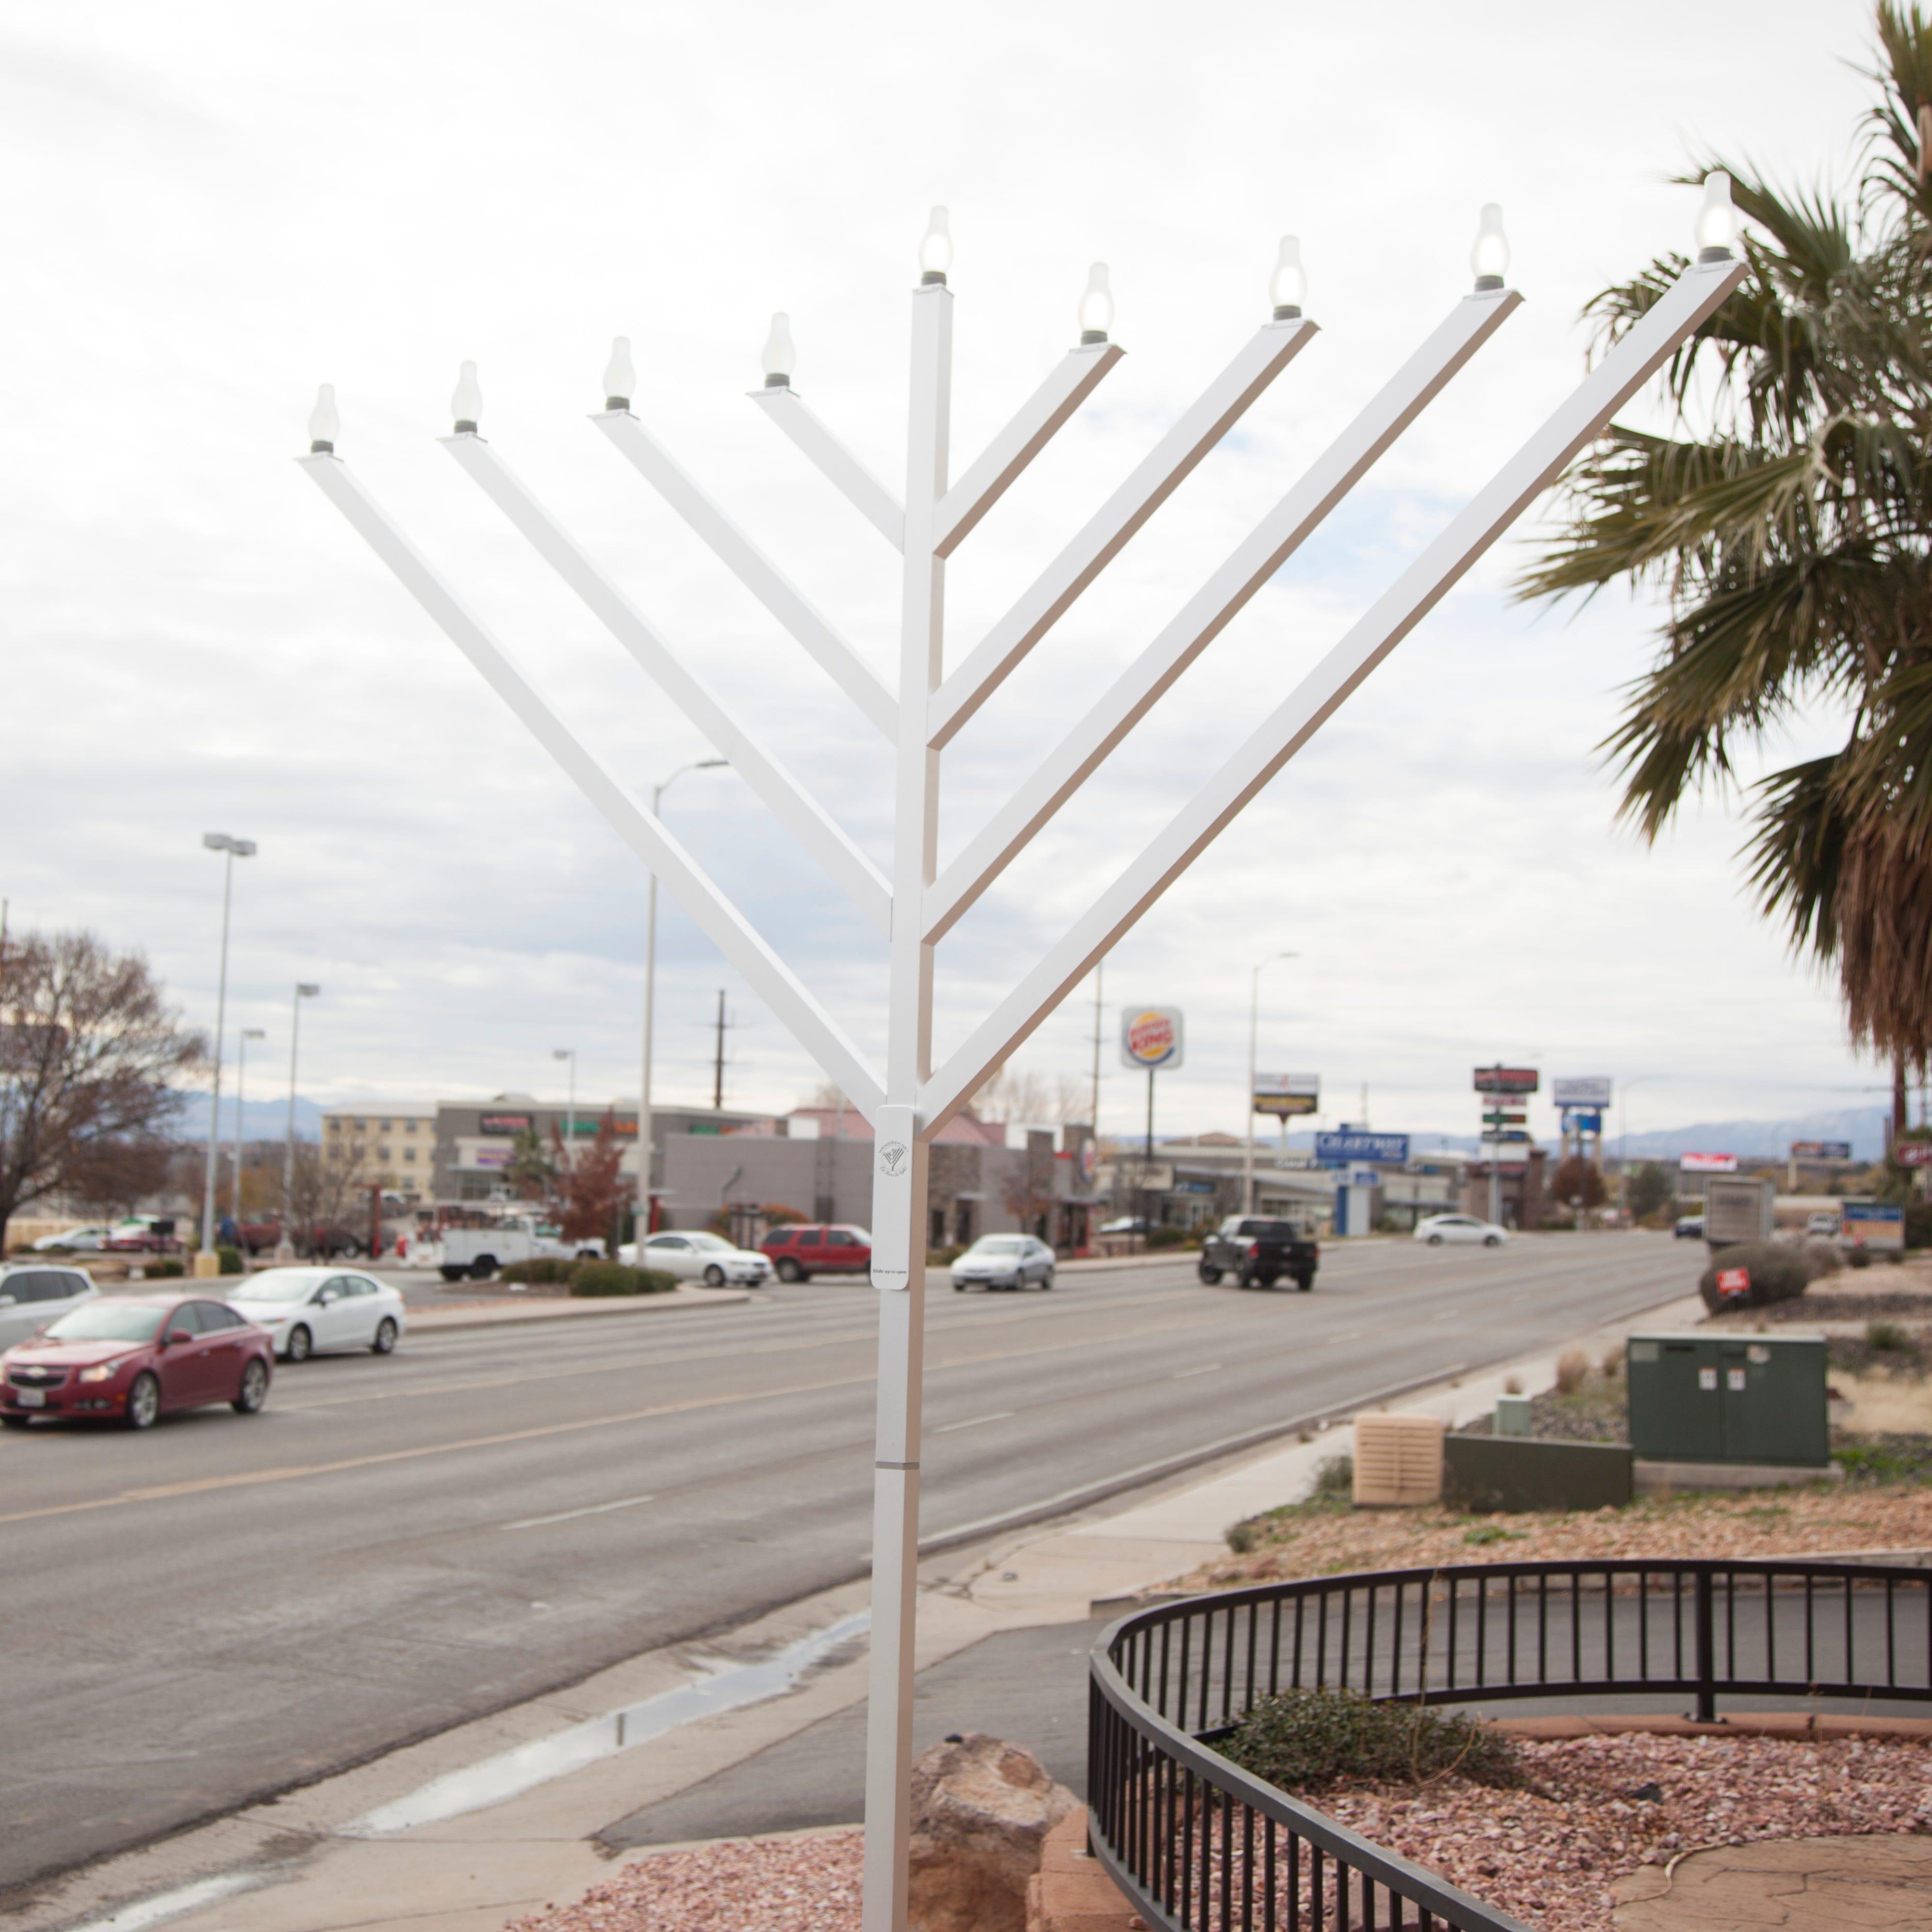 First public menorah lighting in St. George will feature Hanukkah food, games